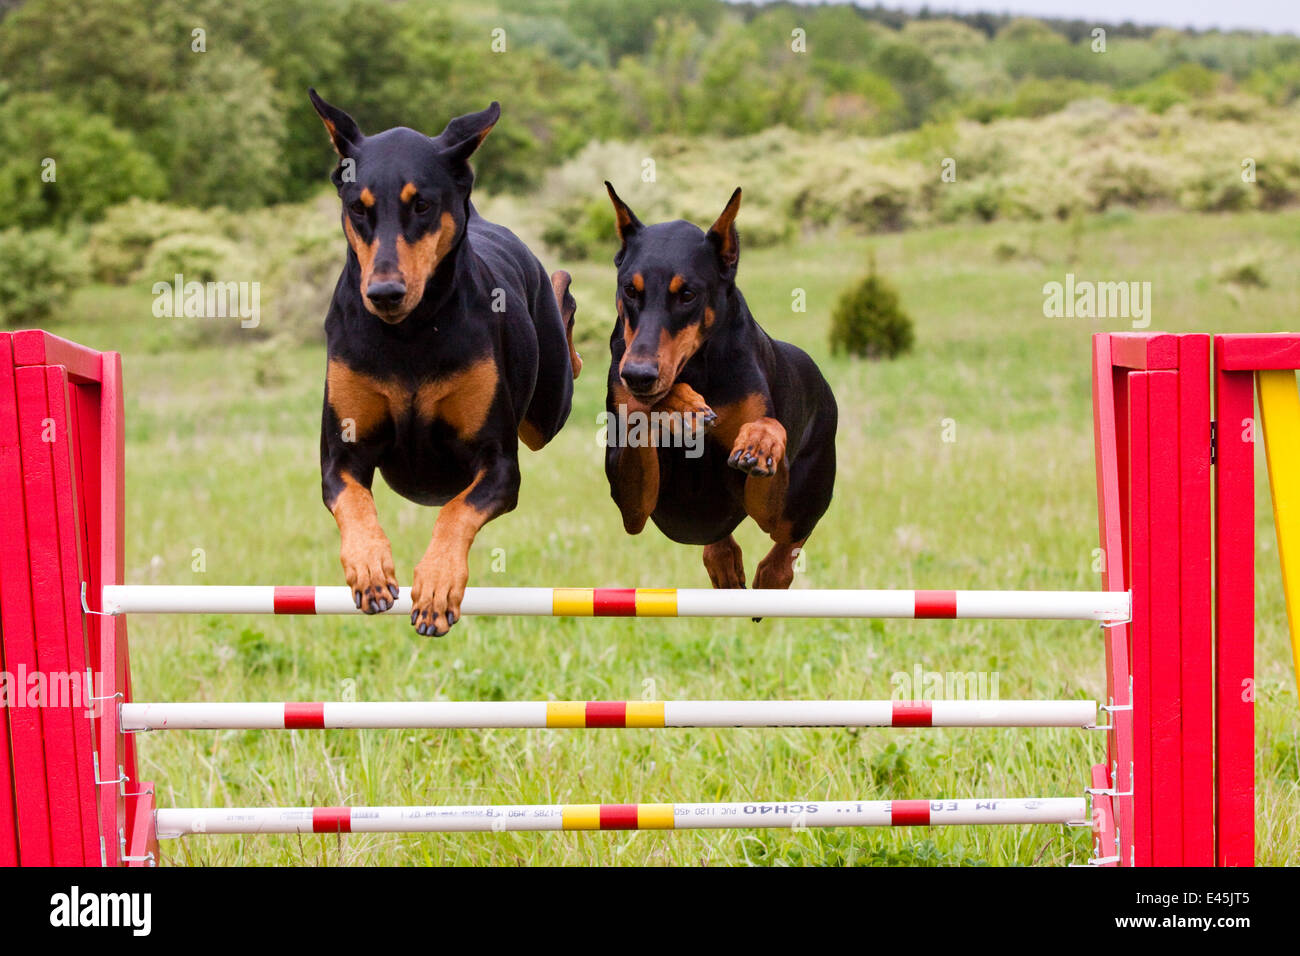 Domestic dog, two Doberman Pinchers jumping over agility course hurdle, Rockford, Illinois, USA - Stock Image